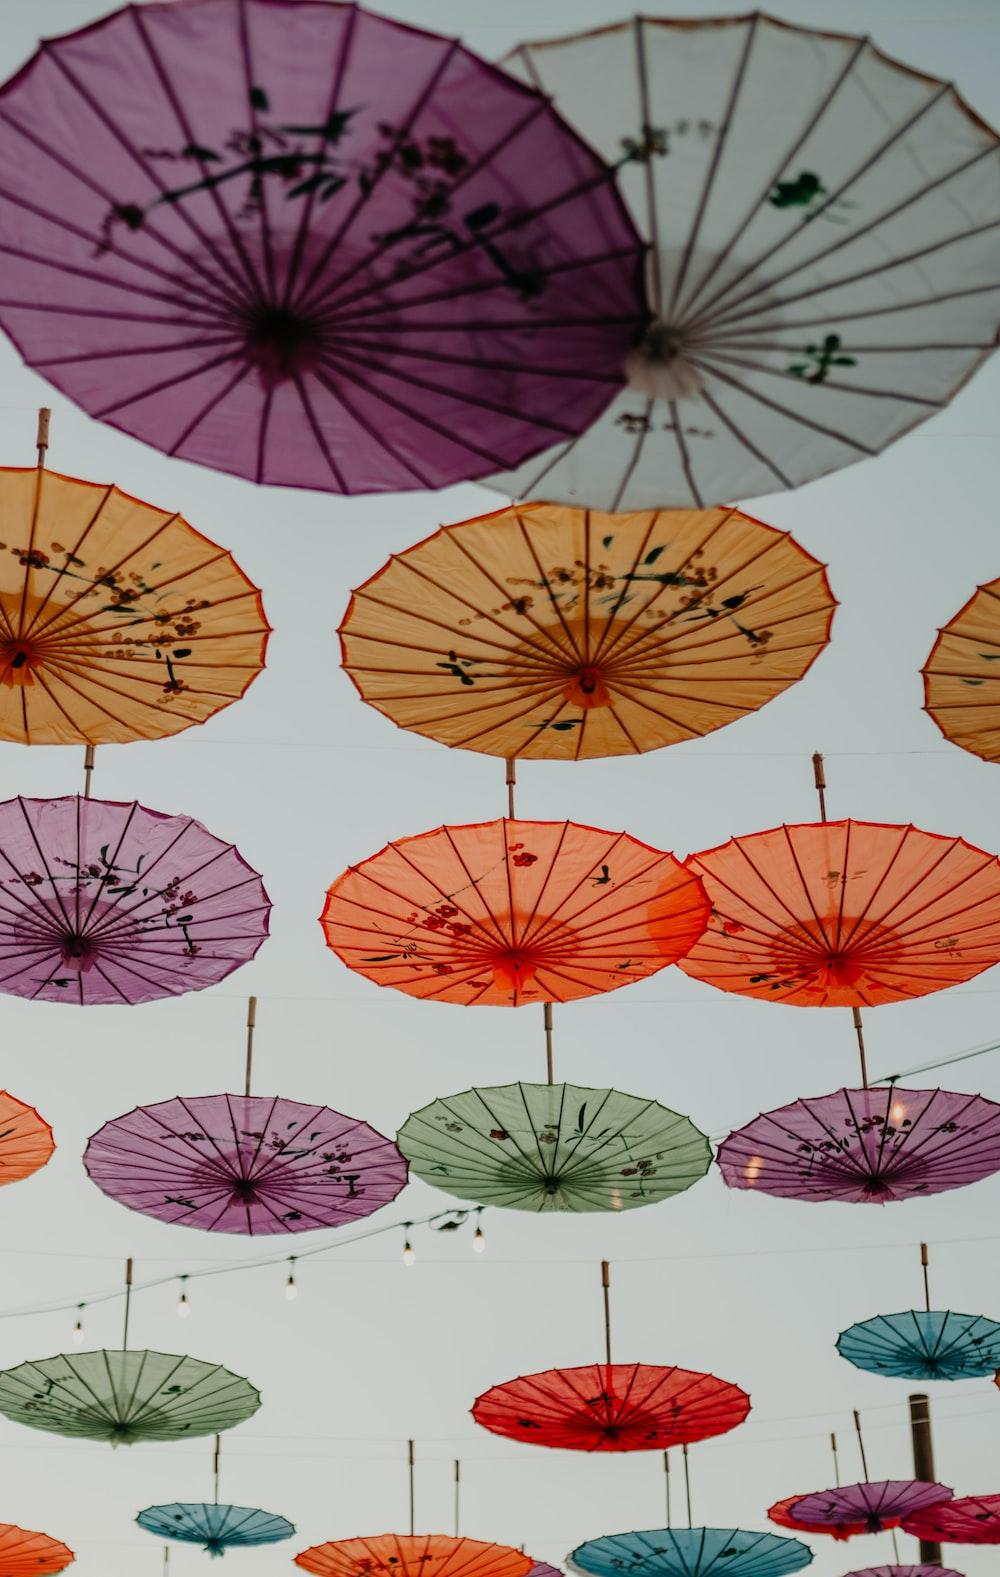 red and white umbrella lot